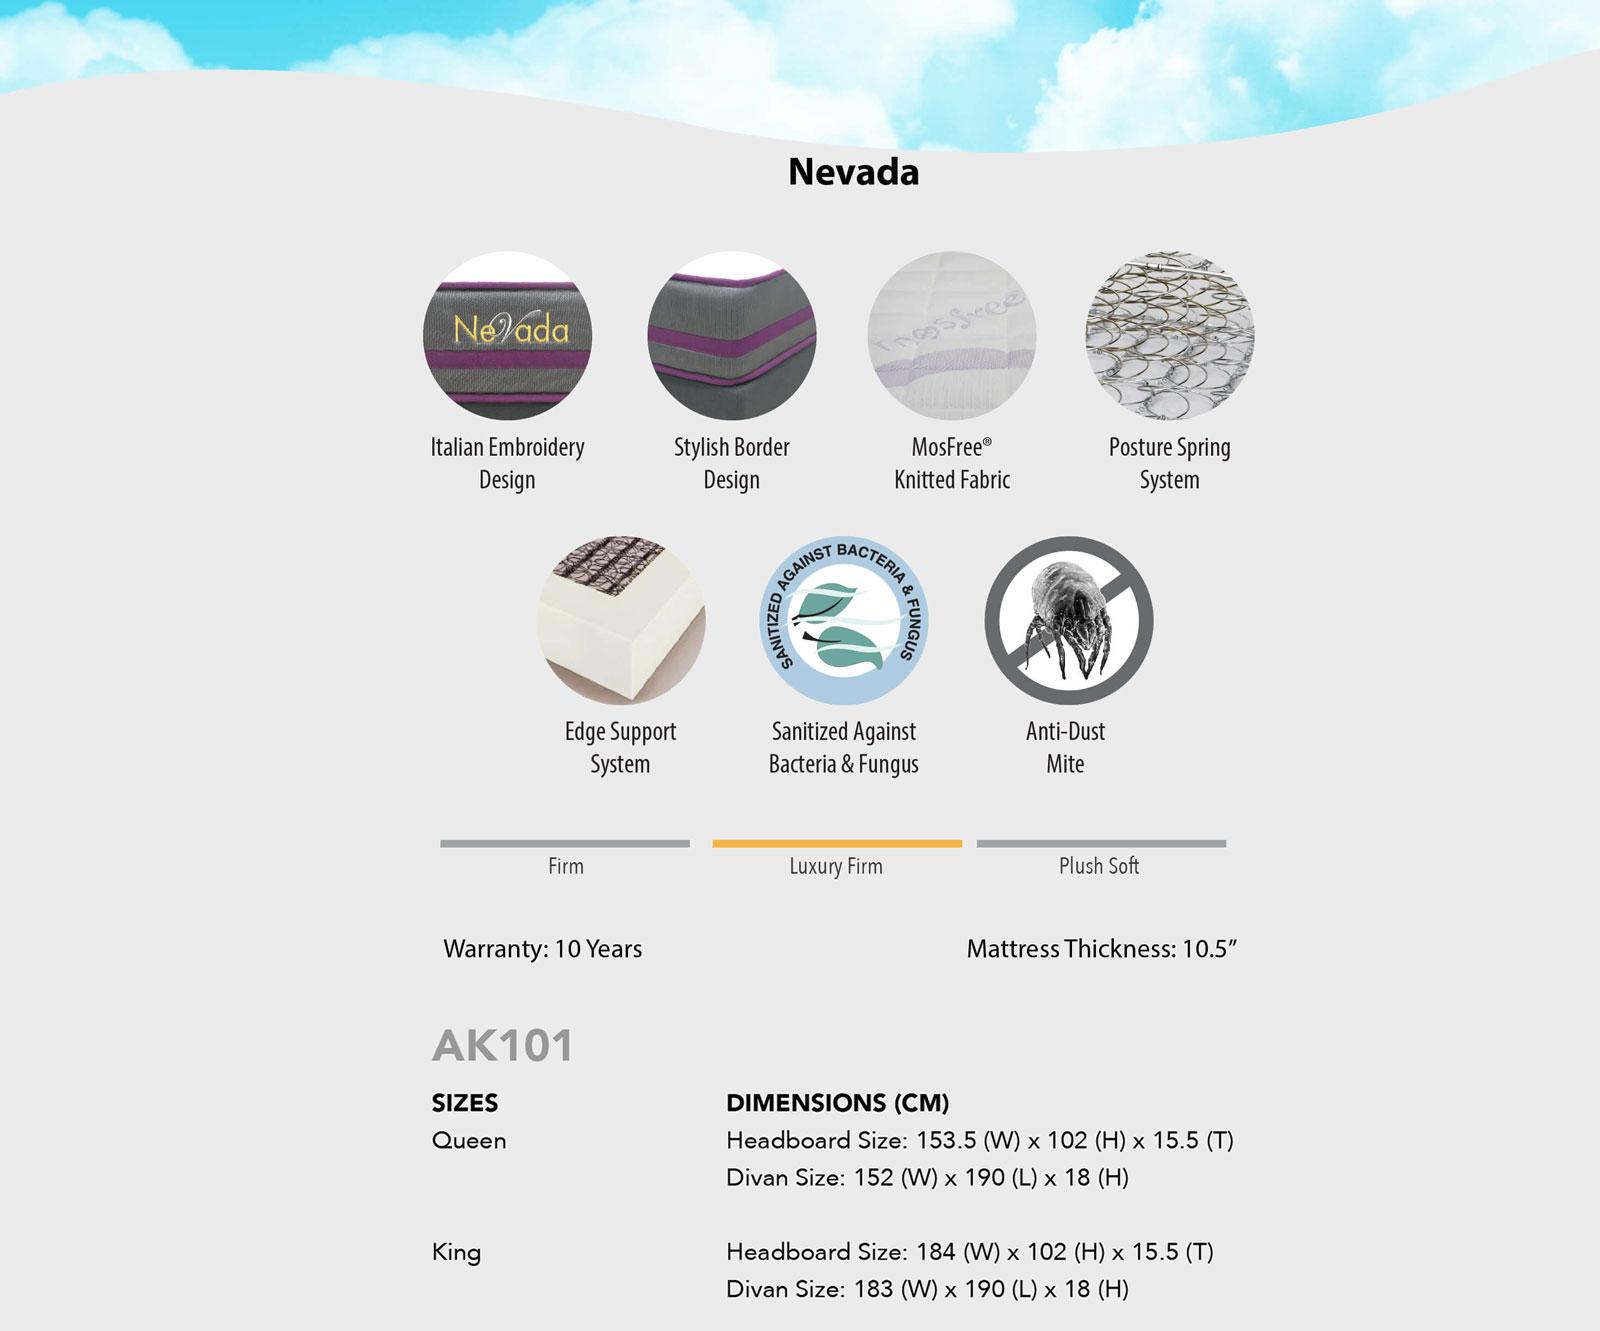 gn-nevada-details.jpg